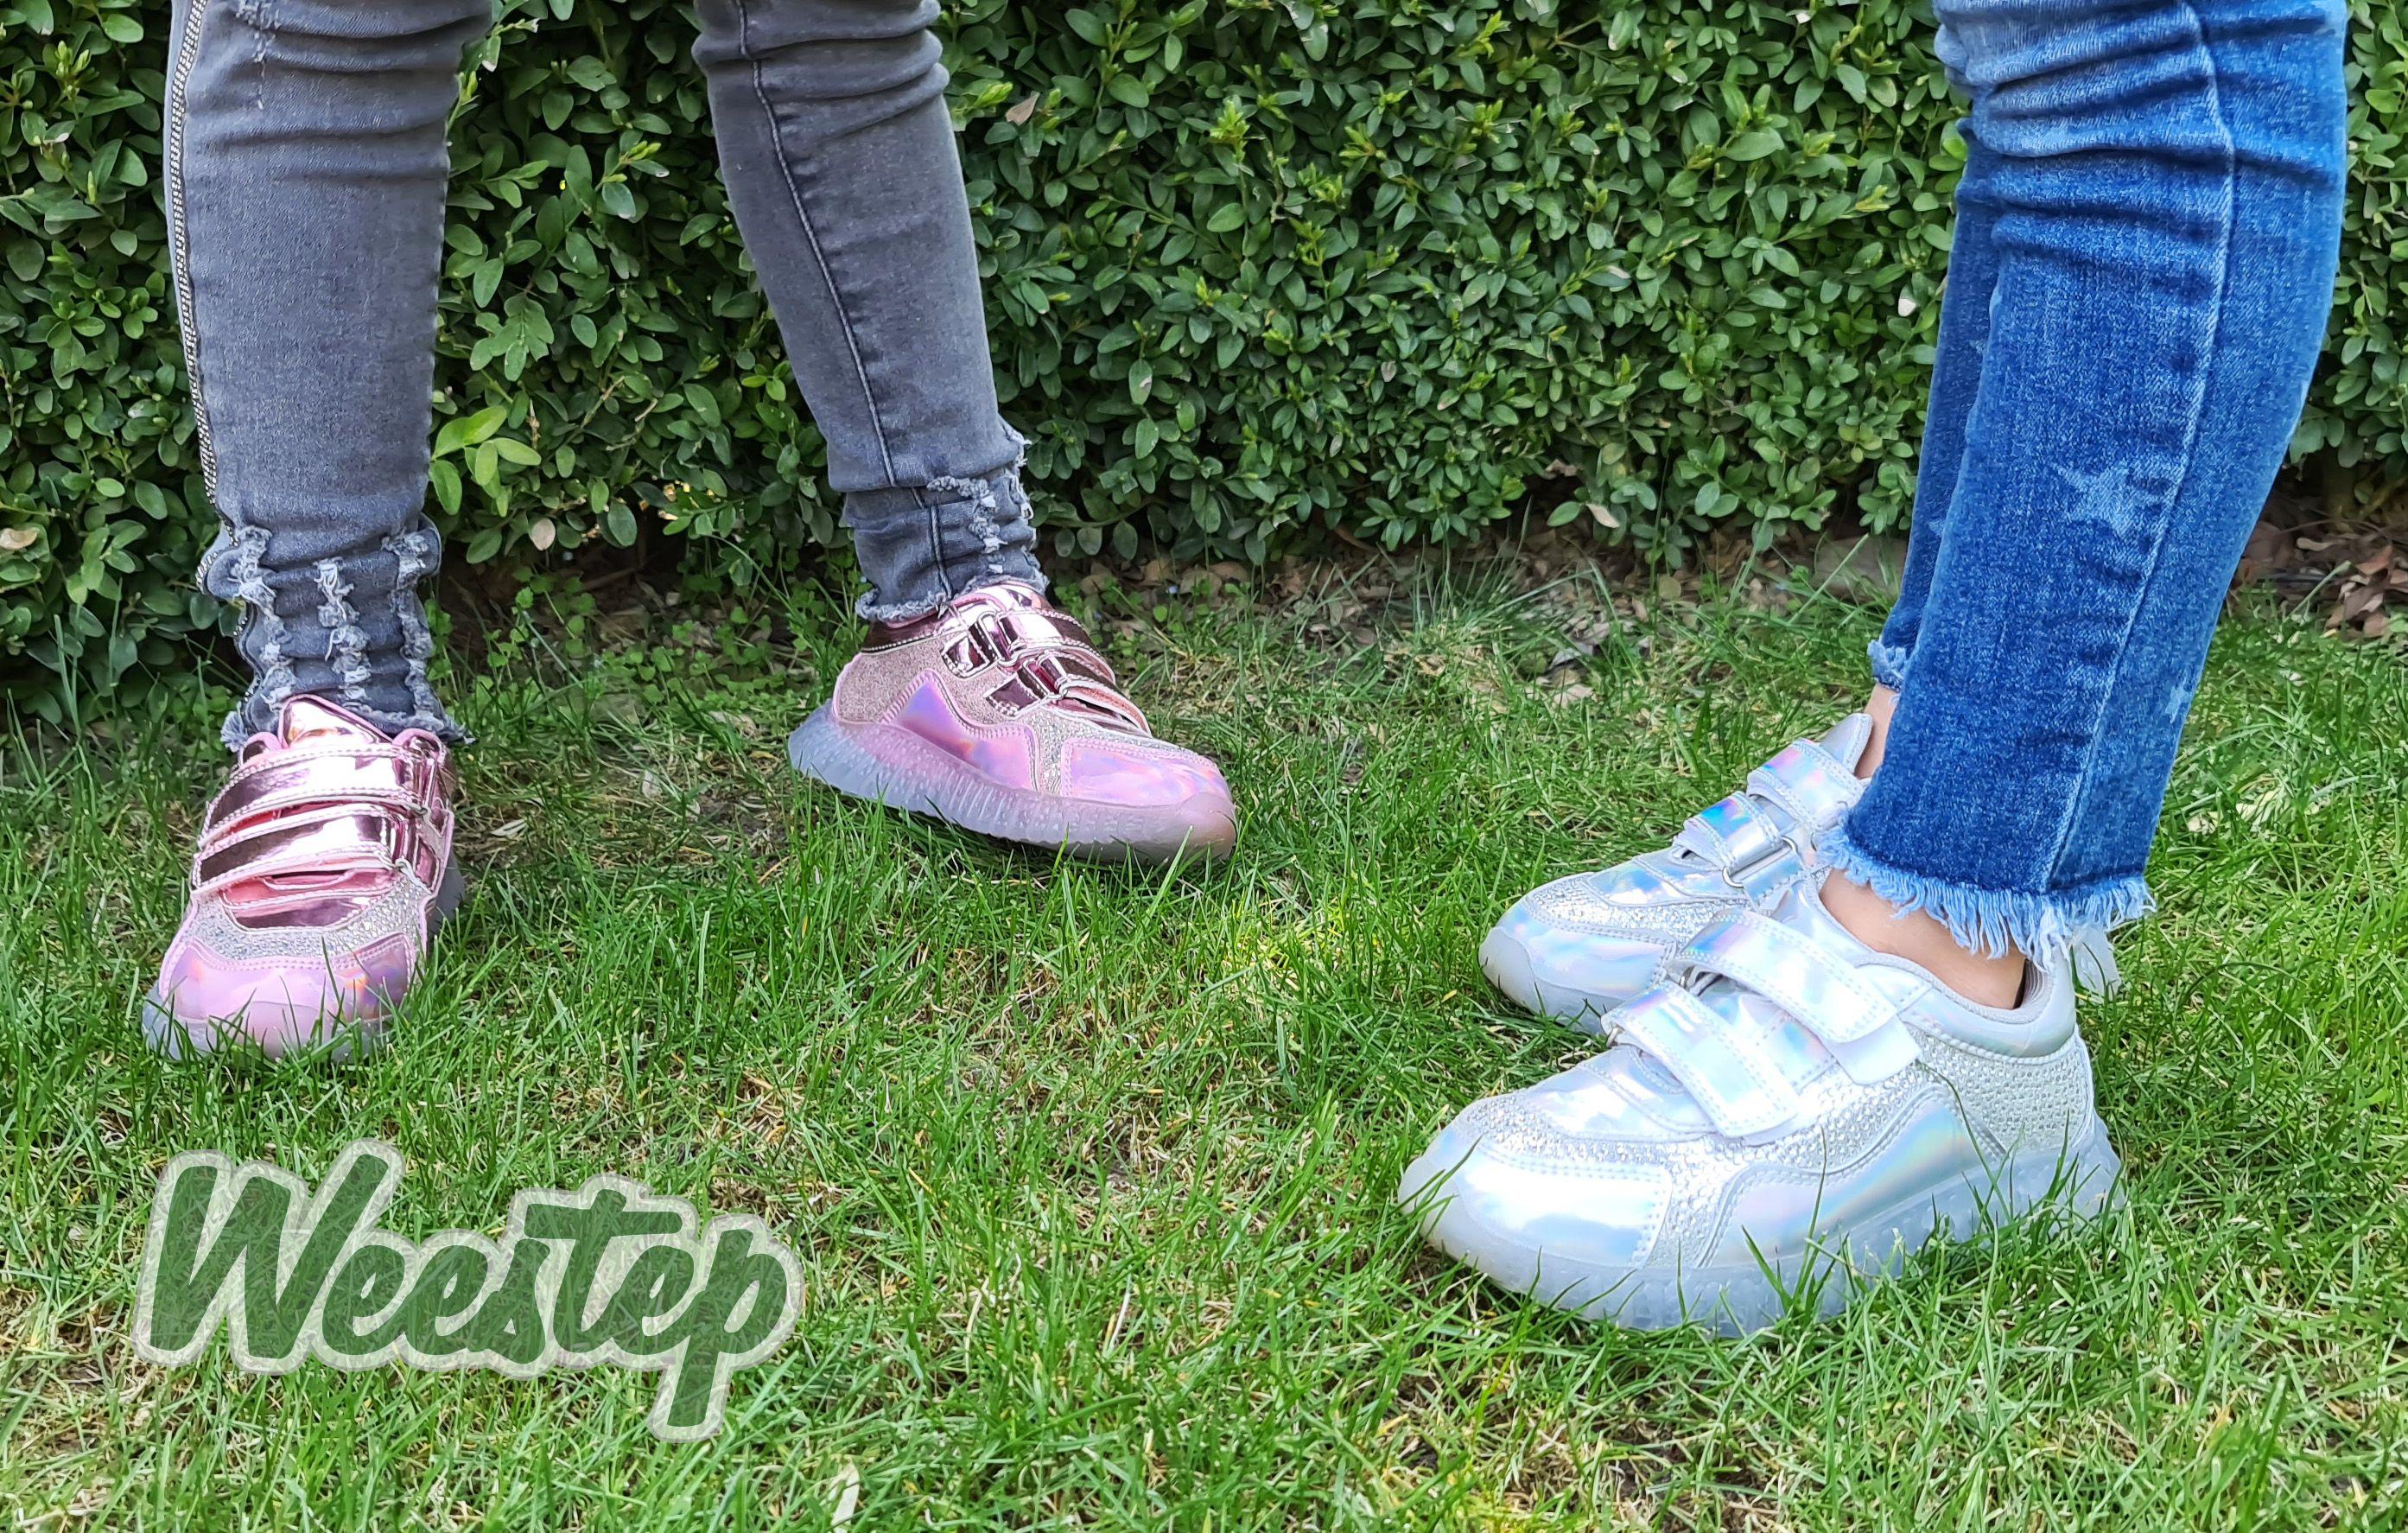 Weestep Pl Childrens Shoes Wholesale Shoes Summer Shoes